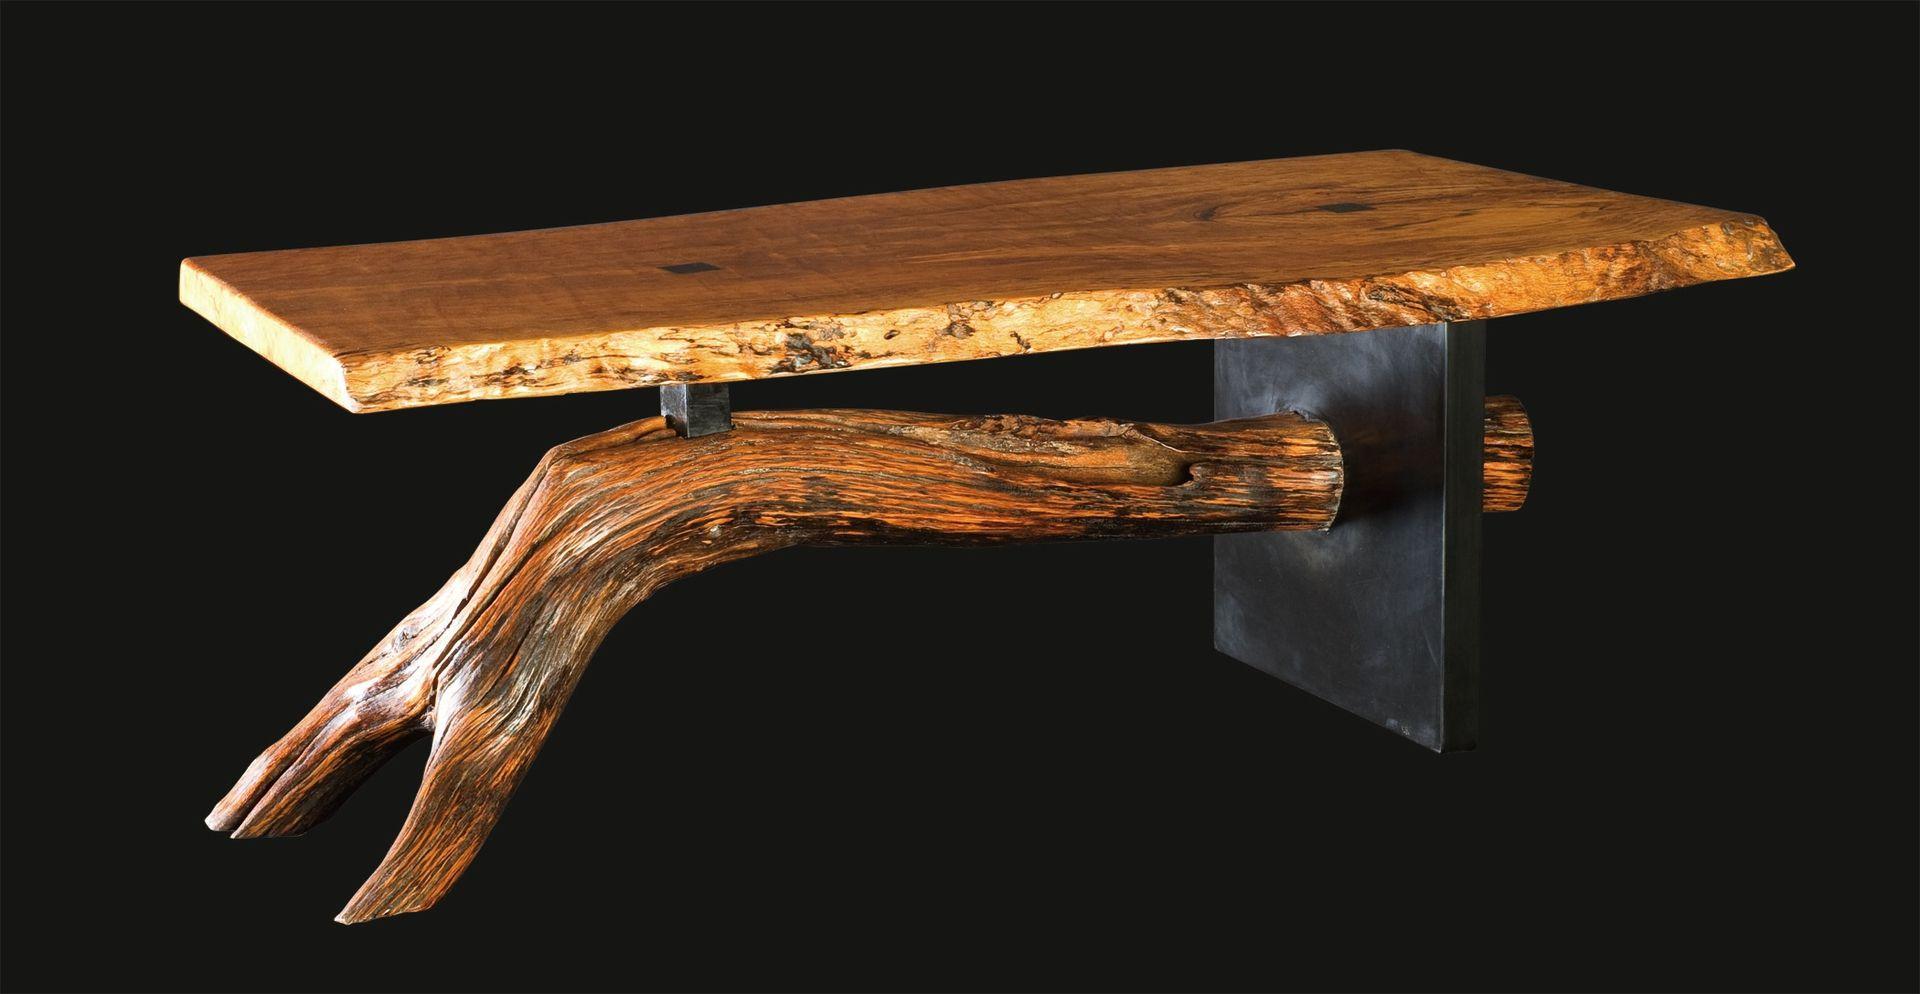 Love Natural Wood Rustic Furniture Log Furniture Coffee Table Wood [ 994 x 1920 Pixel ]